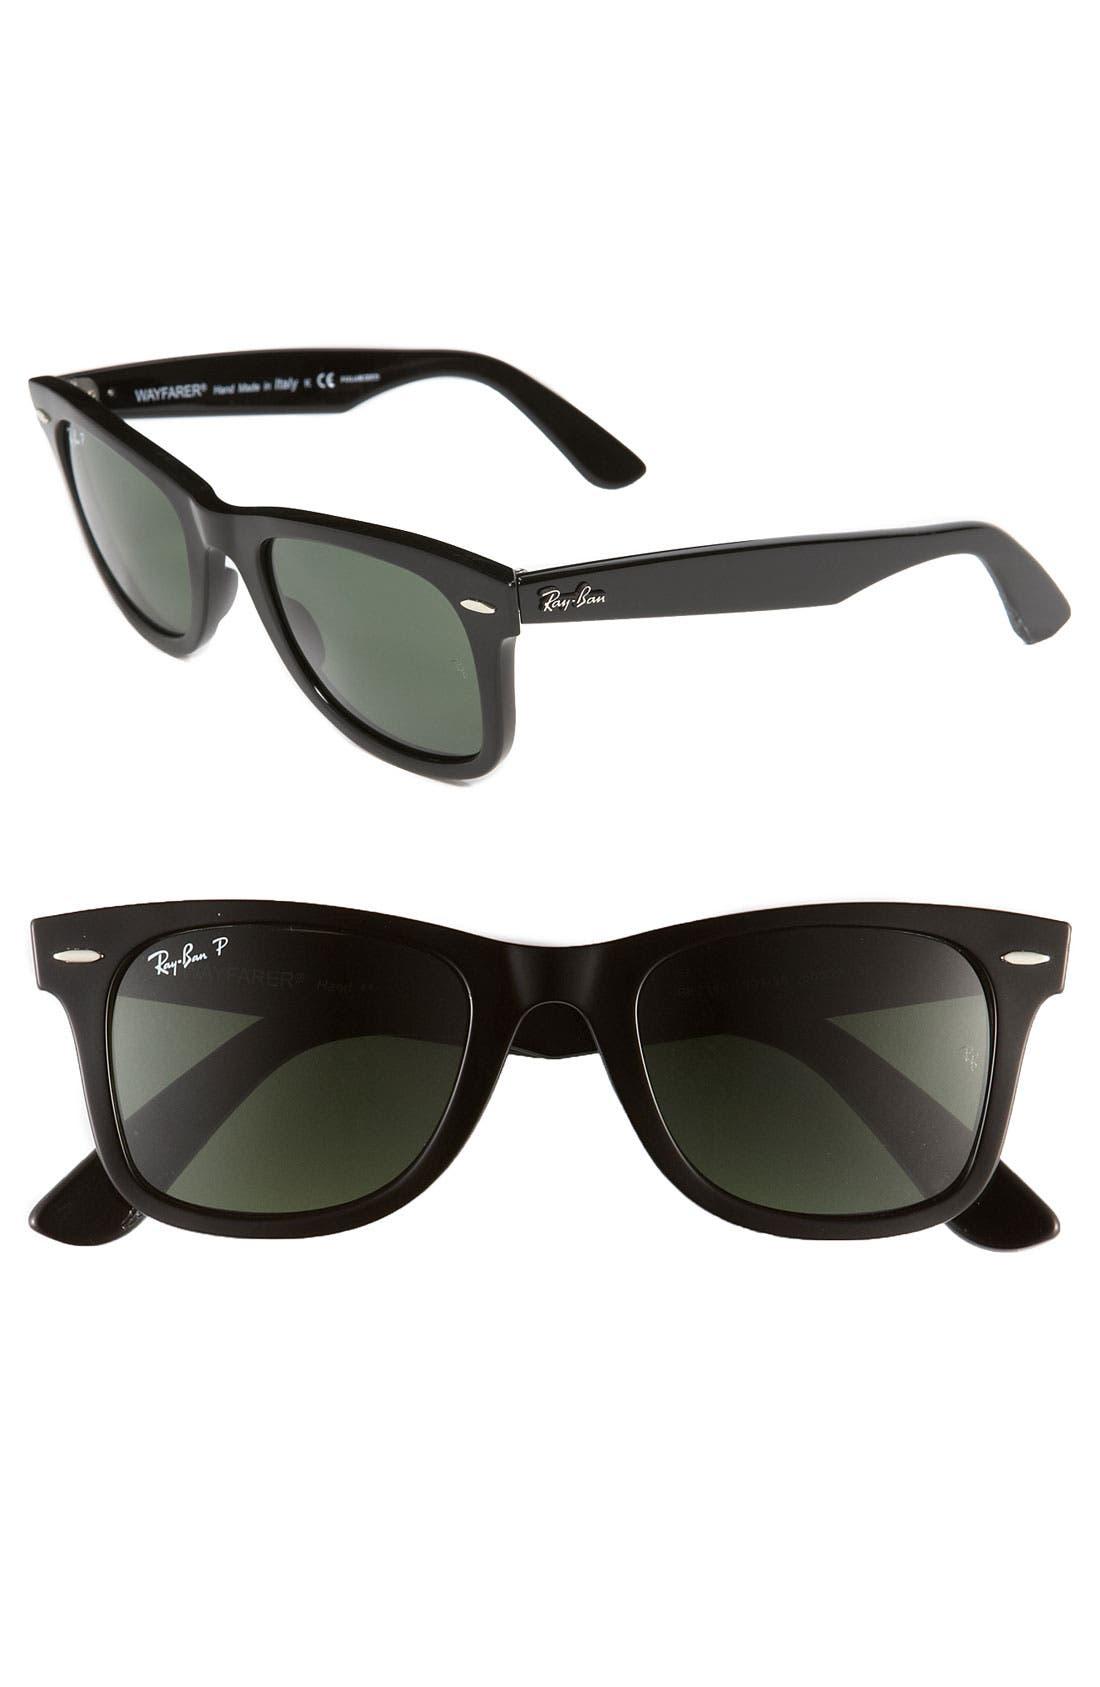 Standard Classic Wayfarer 50mm Polarized Sunglasses,                             Main thumbnail 1, color,                             BLACK POLARIZED